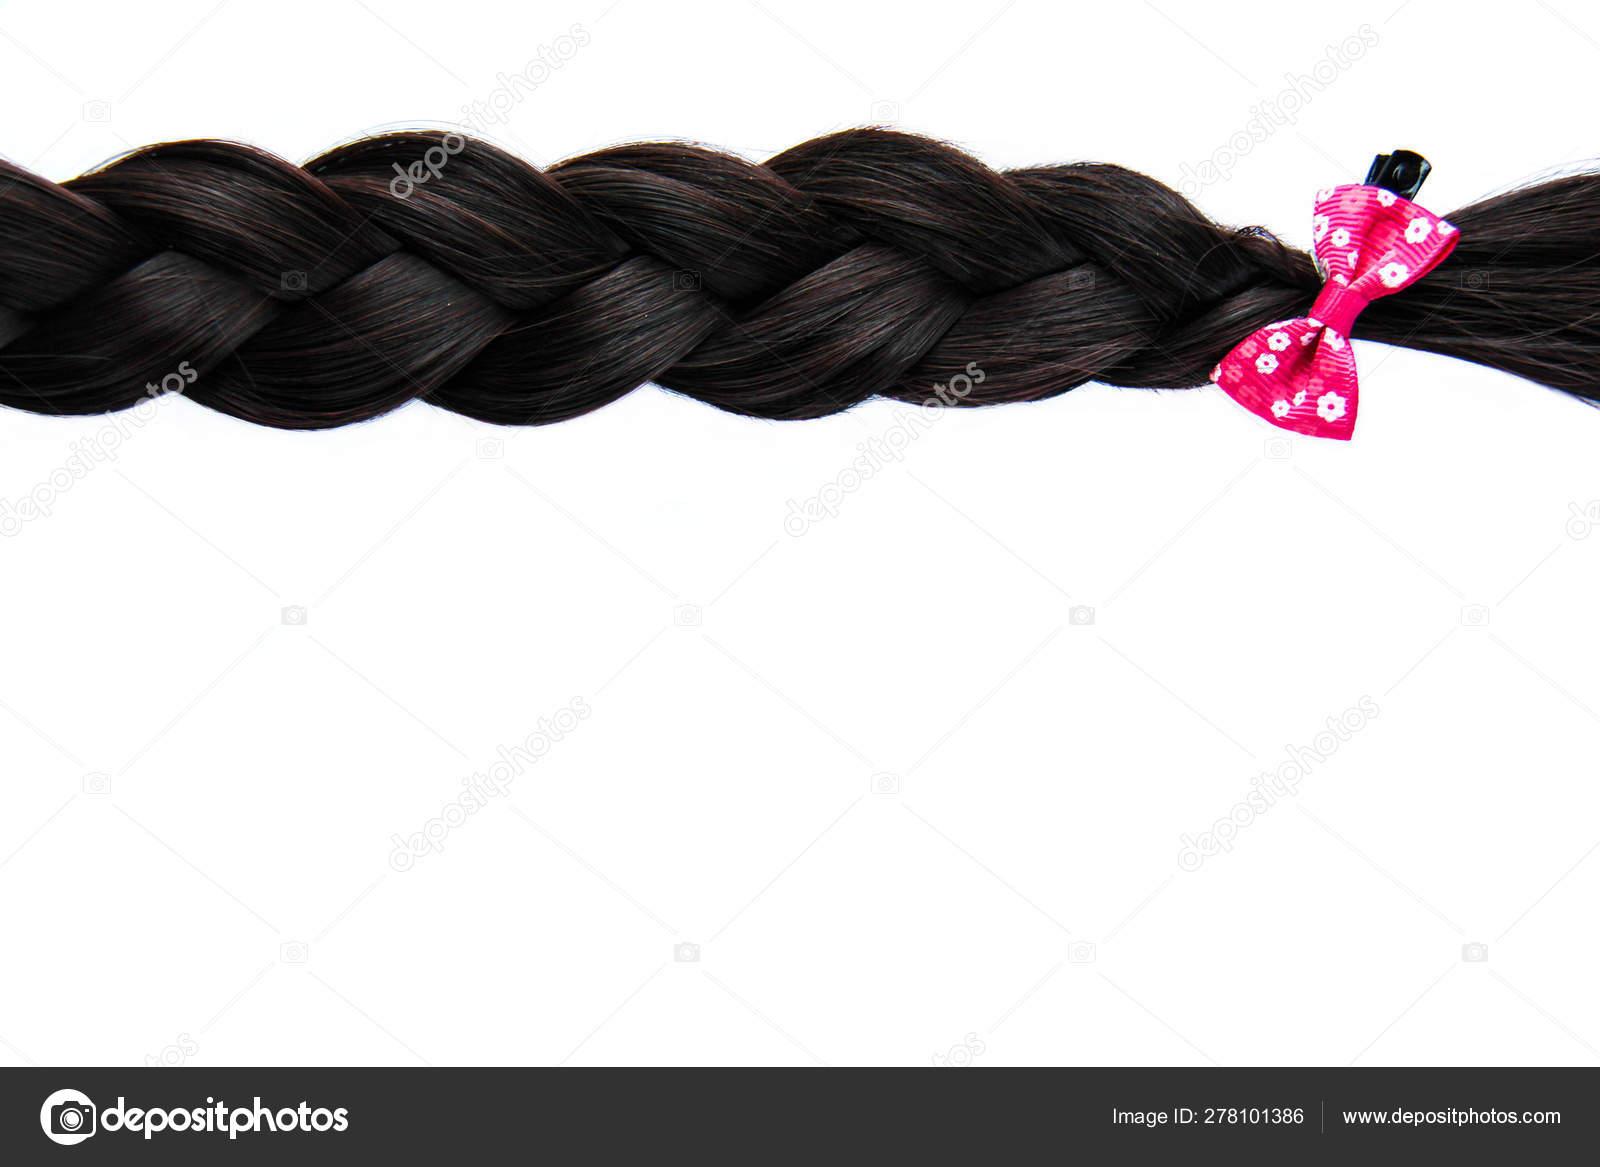 Black Dark Braided Hair Pink Bow Isolated White Background